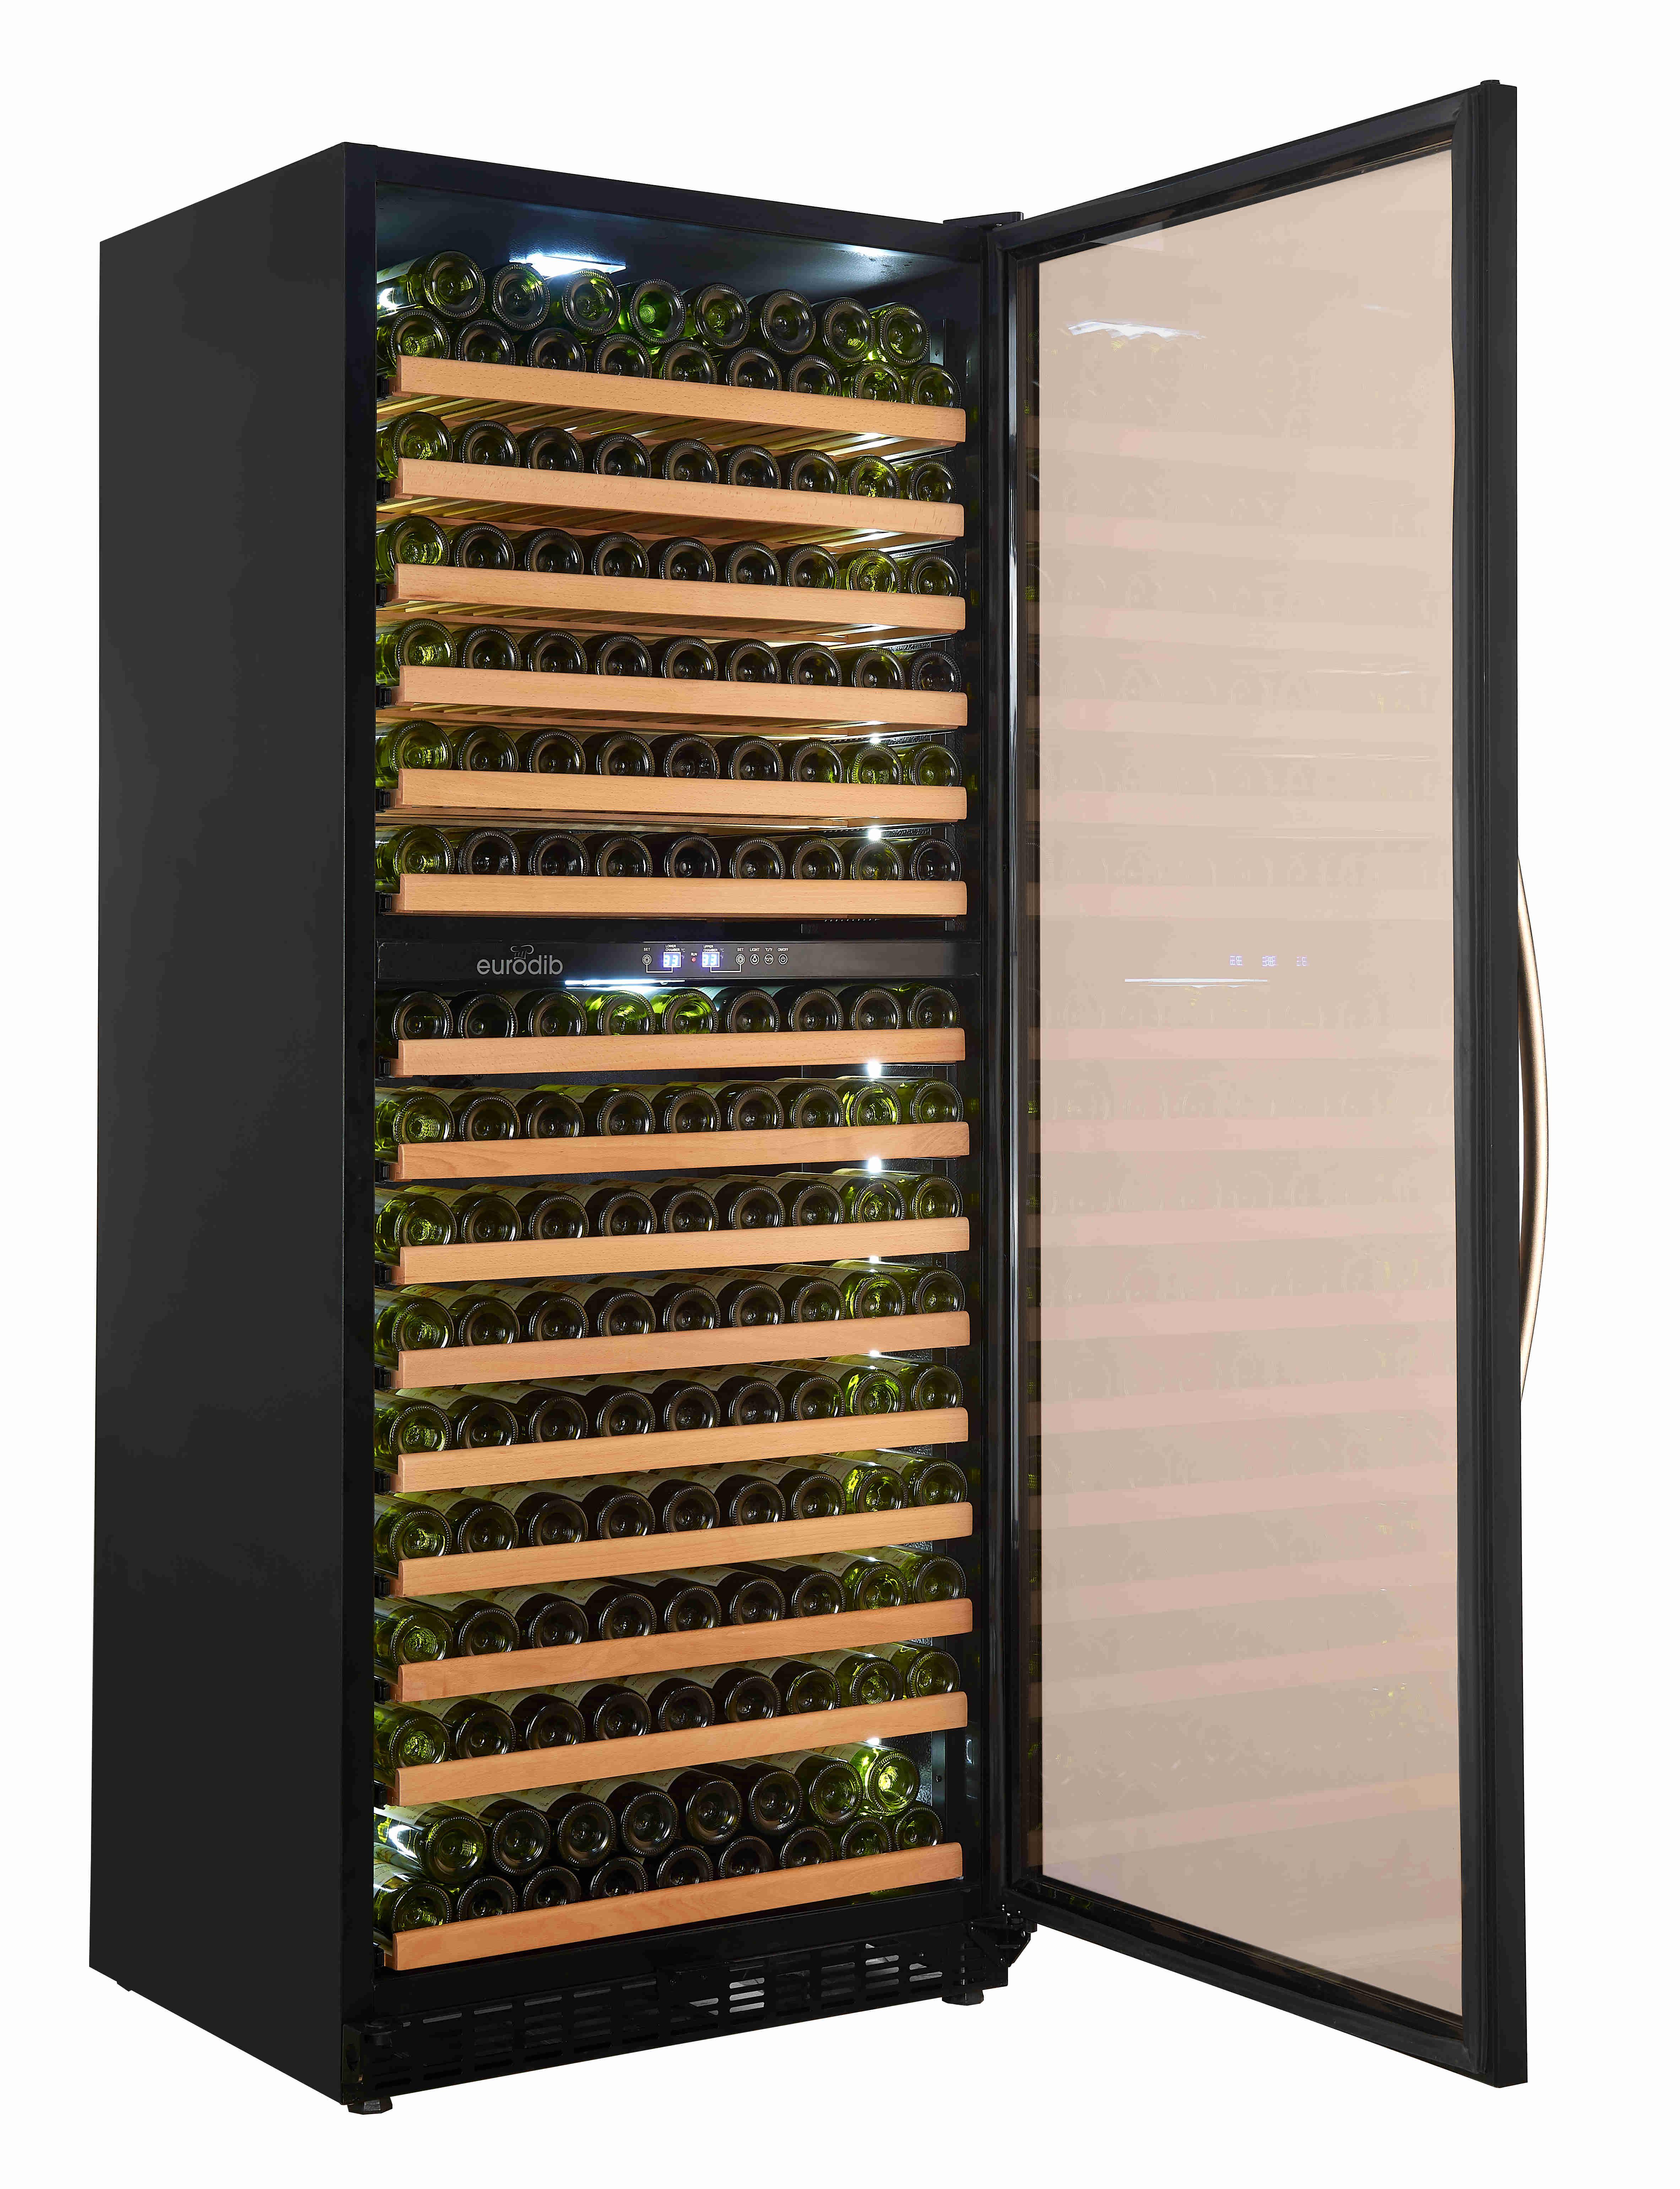 Eurodib USA USF328D wine coolers